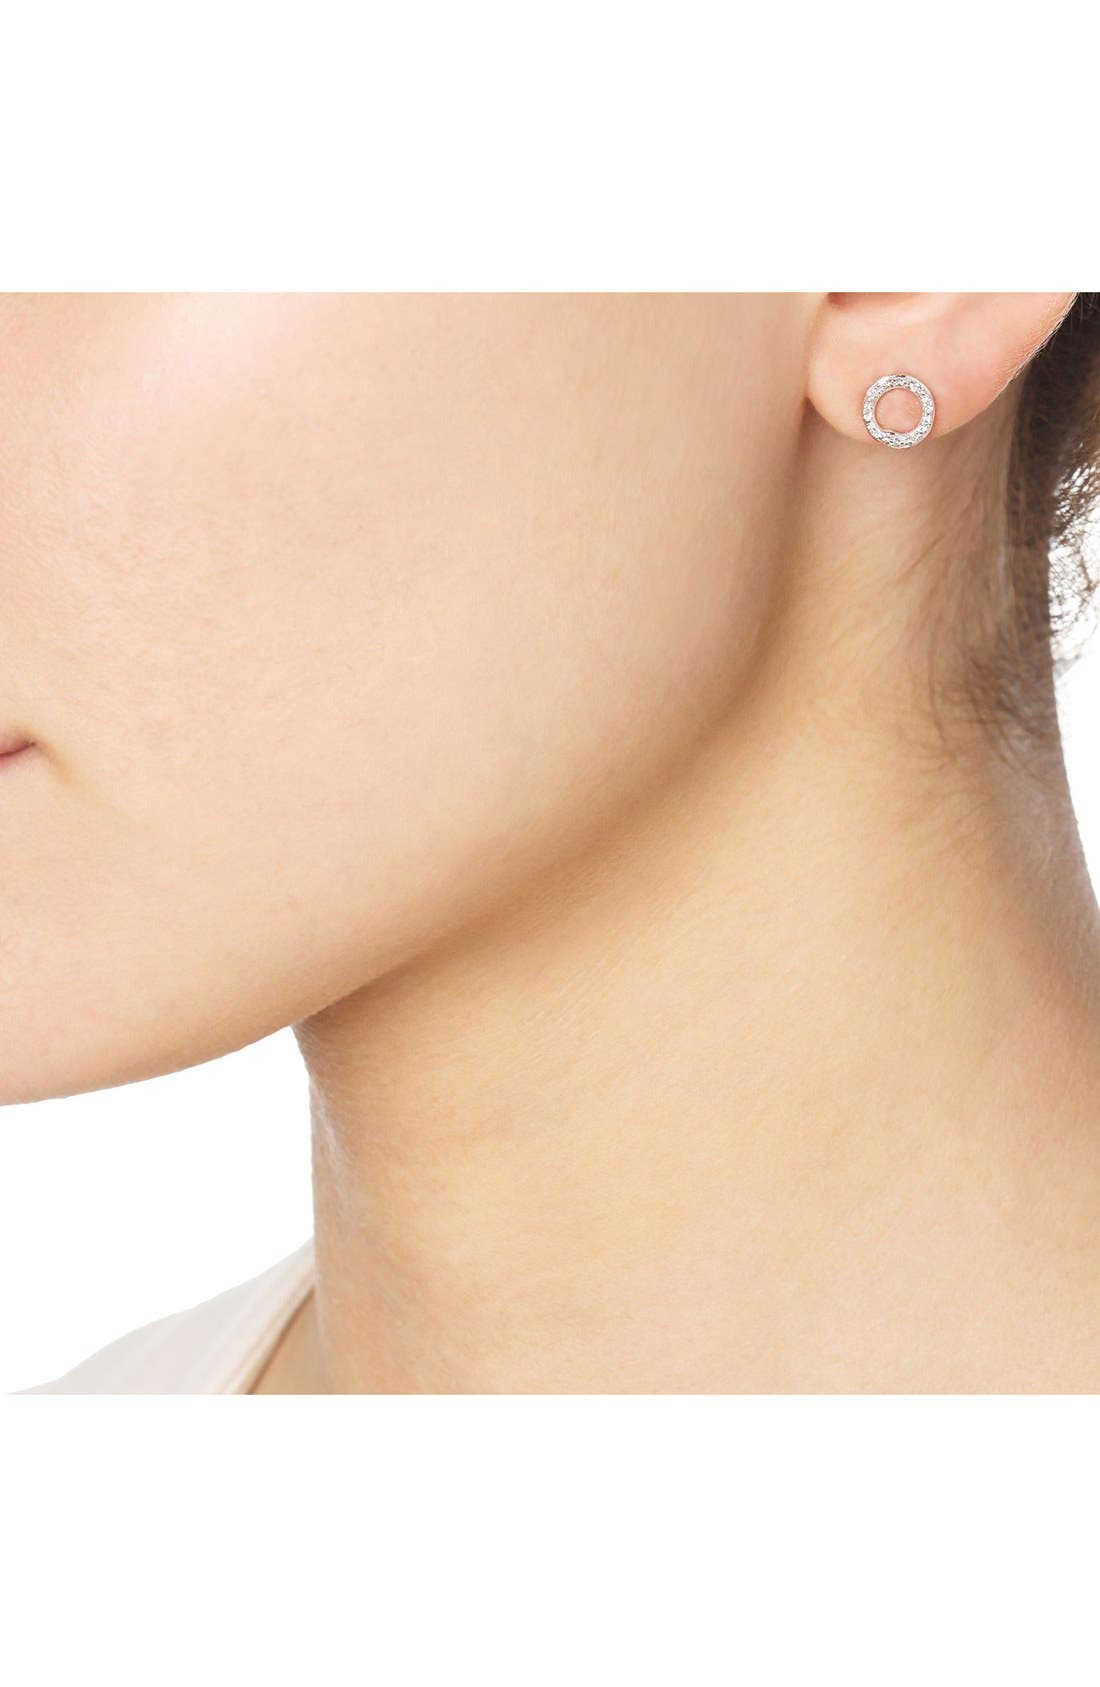 MONICA VINADER, 'Riva' Circle Stud Diamond Earrings, Alternate thumbnail 2, color, ROSE GOLD